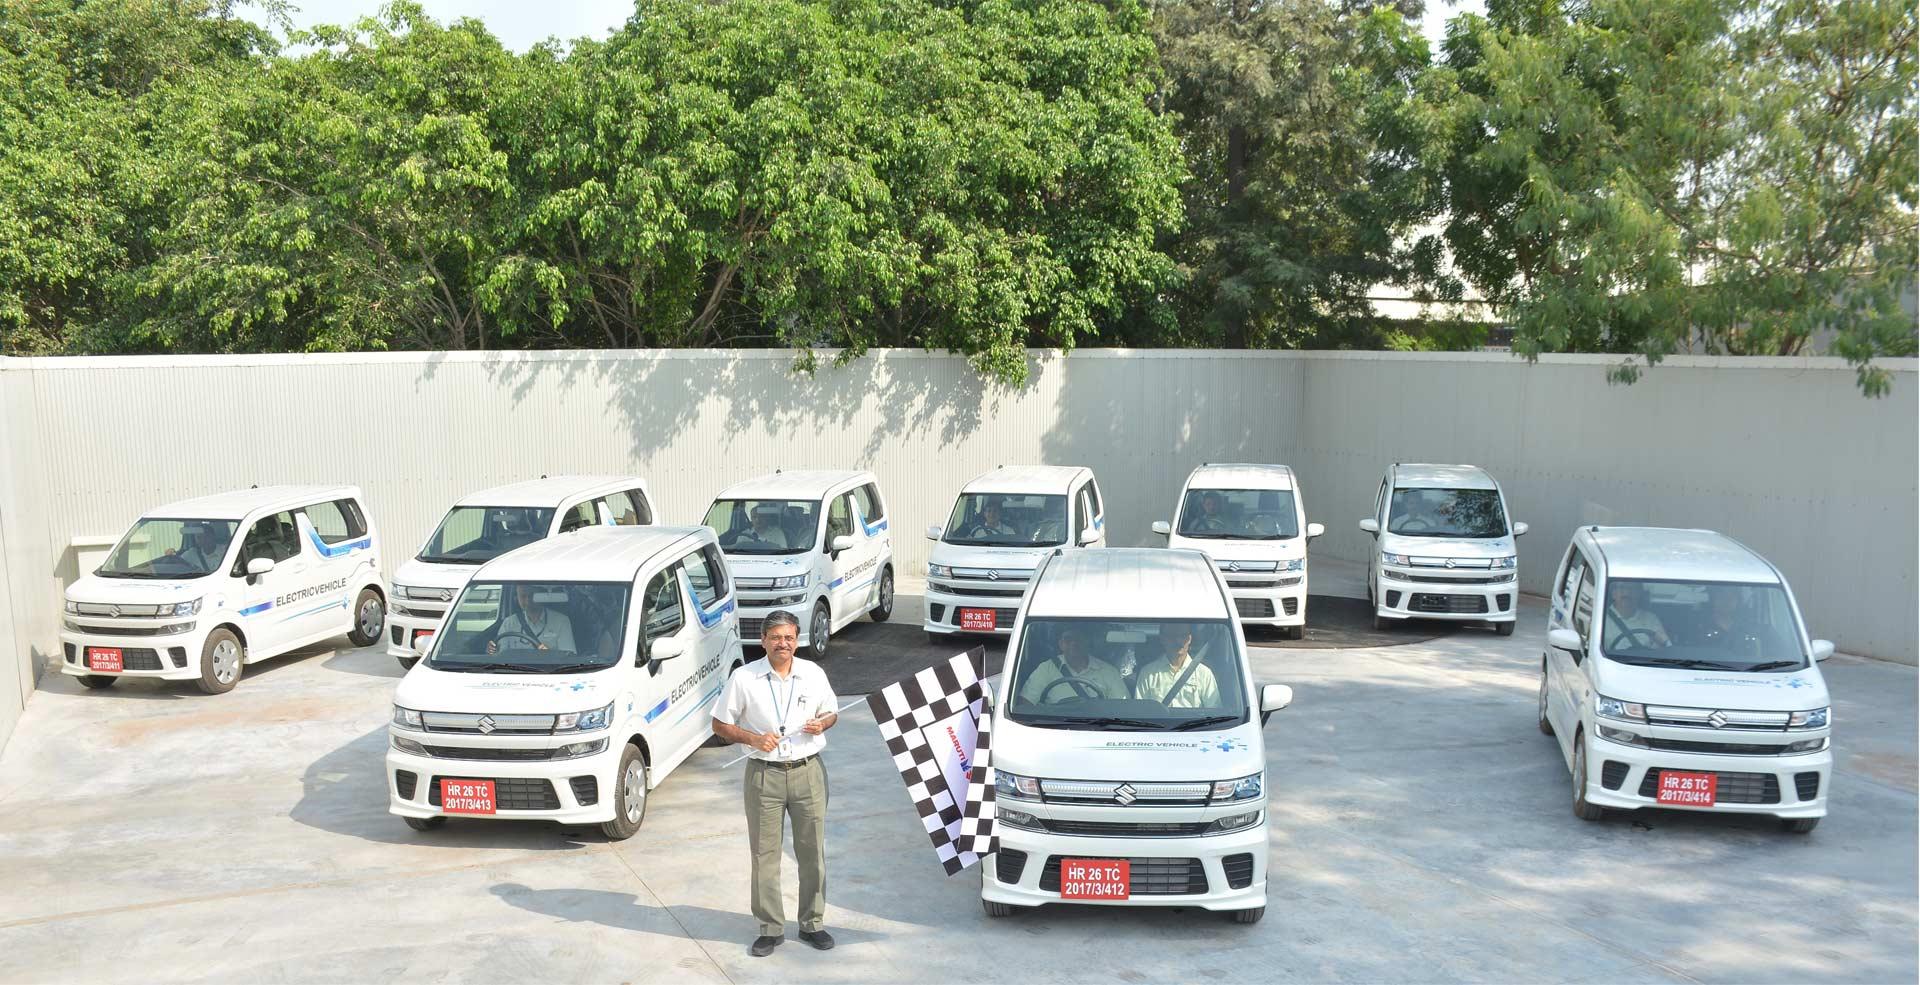 Maruti Suzuki flags-off Electric Vehicles for field testing_2